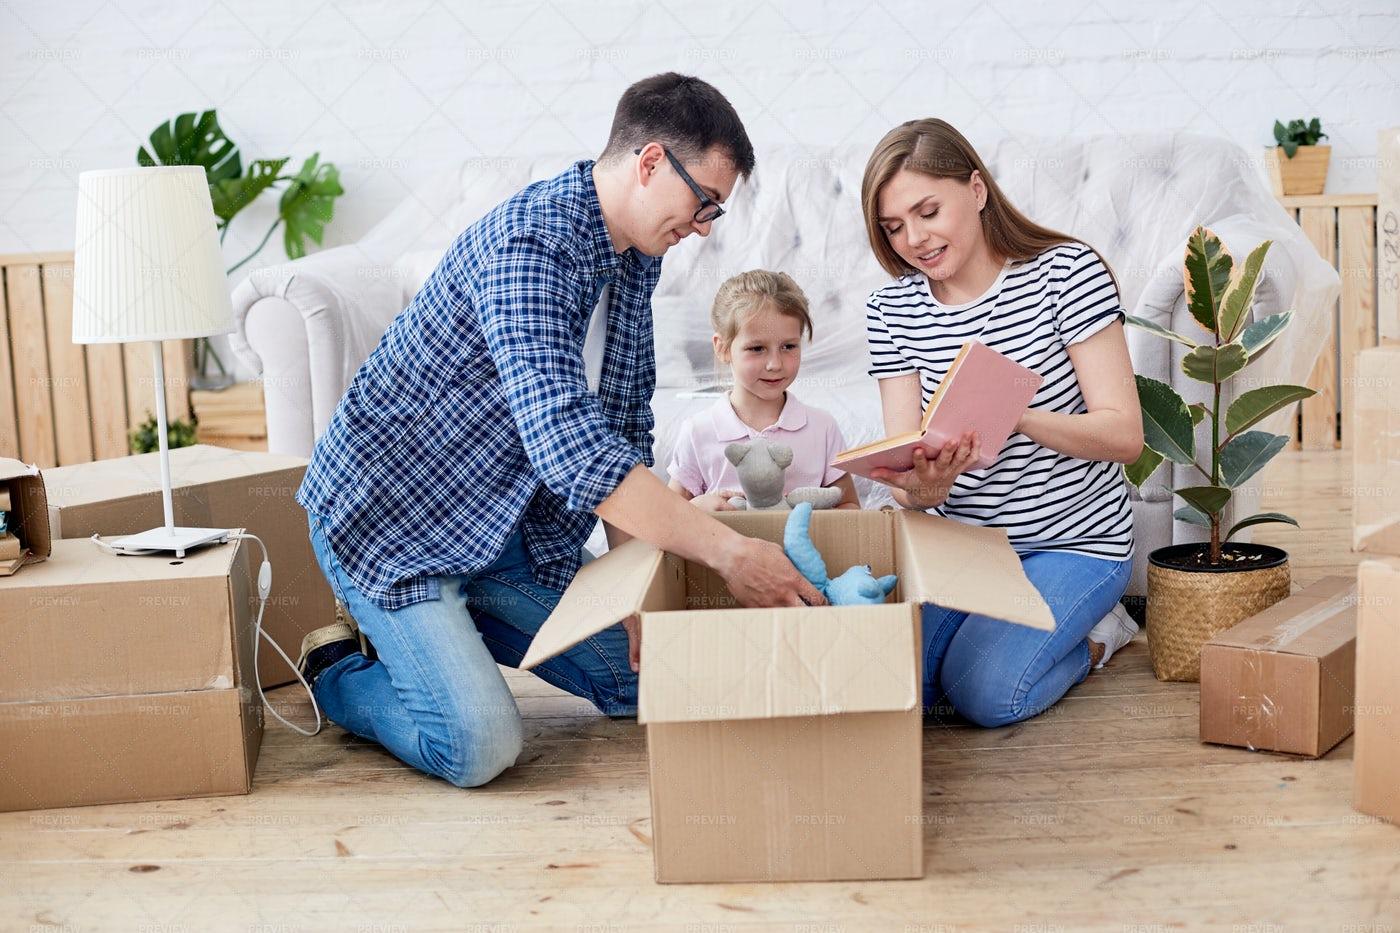 Unpacking Moving Boxes: Stock Photos